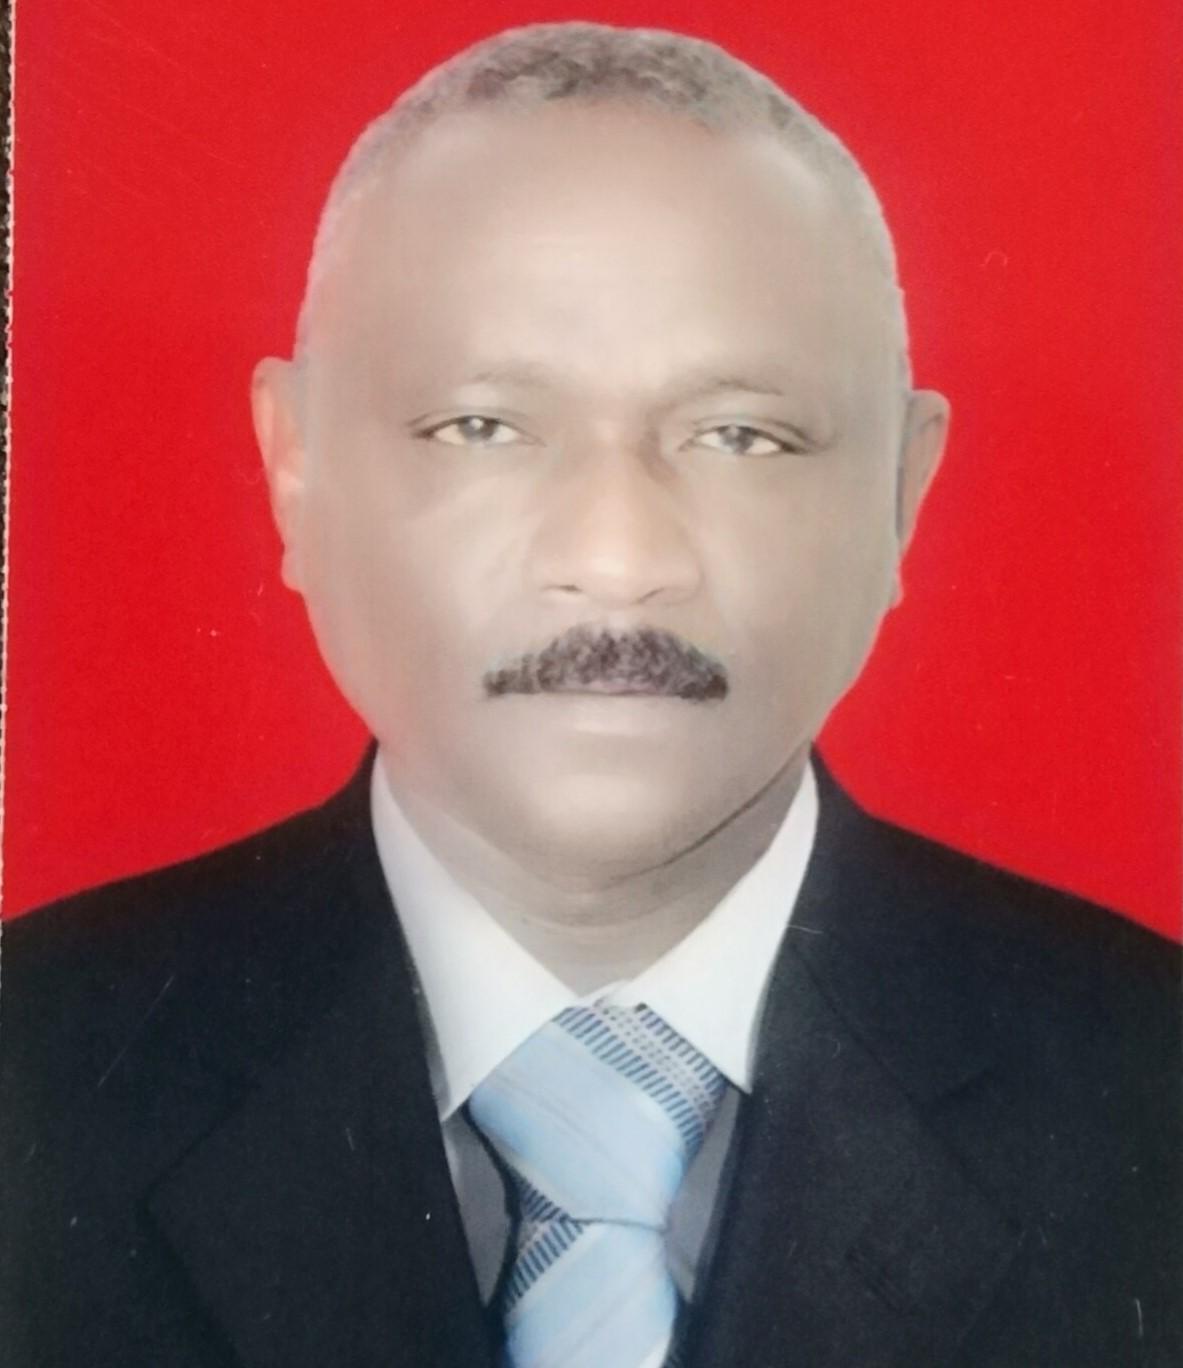 Mustafa Abdalrahman Mohamed